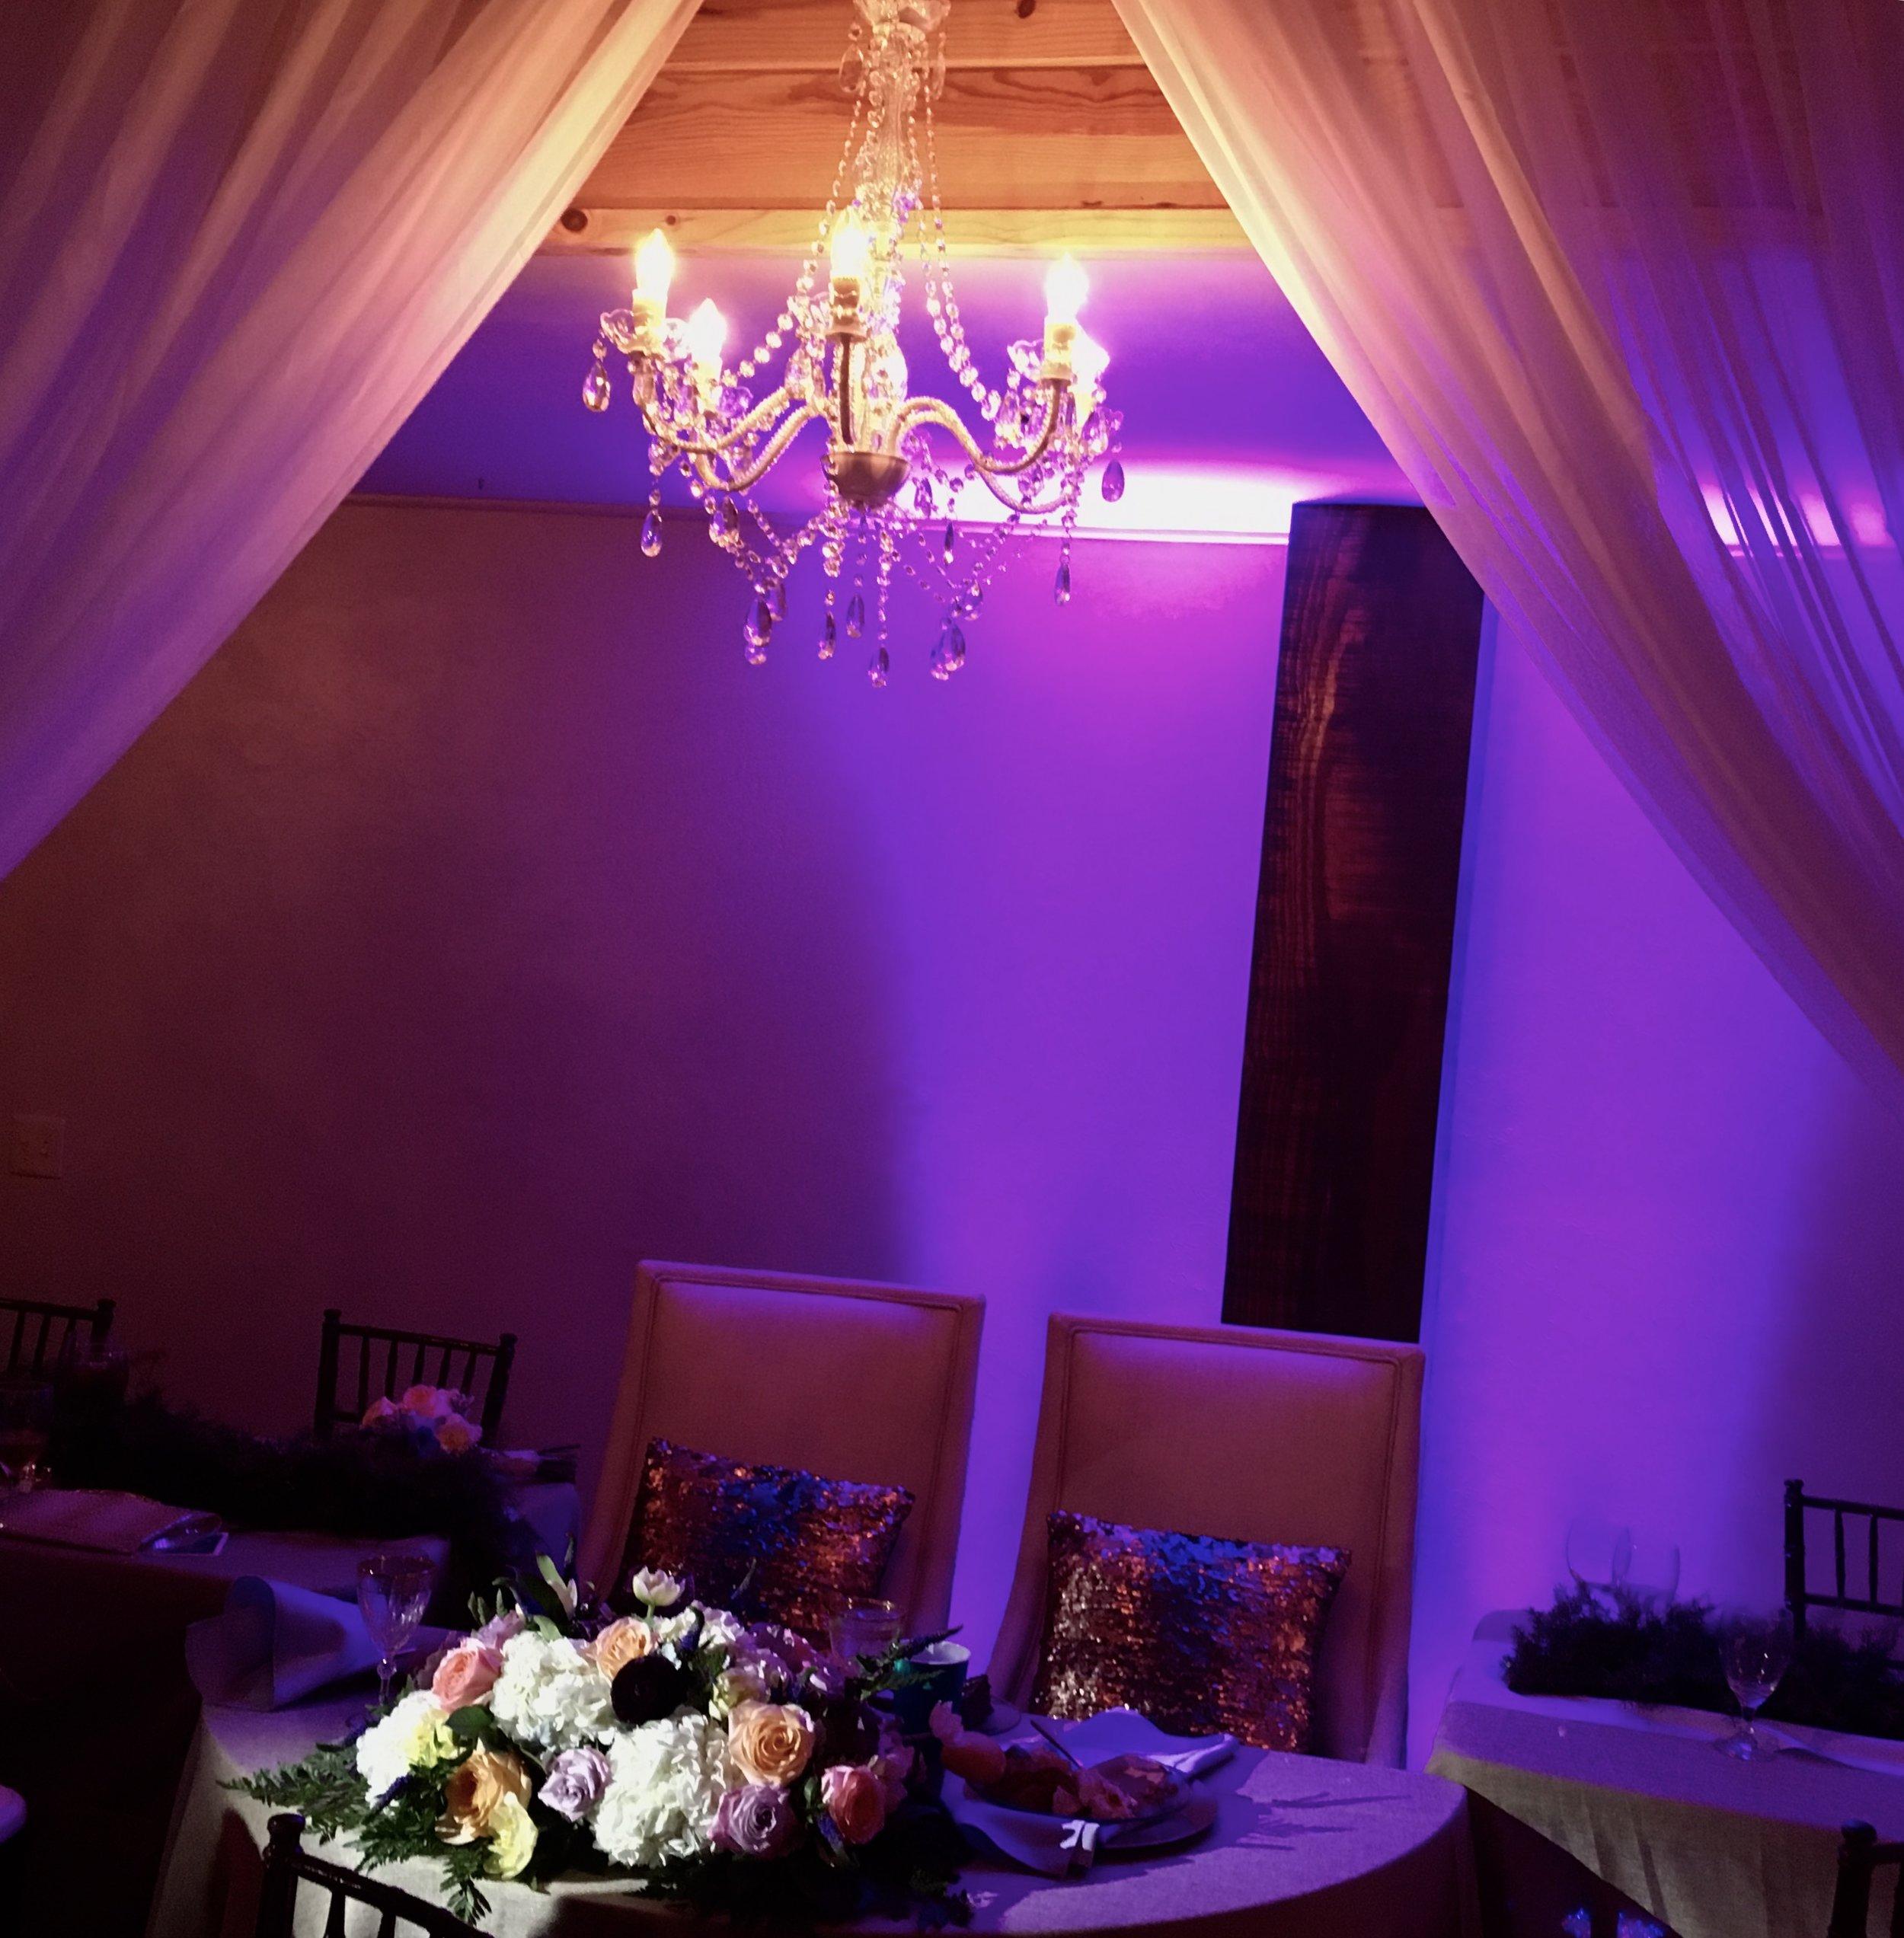 Wedding Planner, Wedding DJ, Lighting, Photo Booth, Wedding Design, Wedding Decorations, Drapery, Uplighting, Fort Smith, Fayetteville, Tulsa, Arkansas, Oklahoma